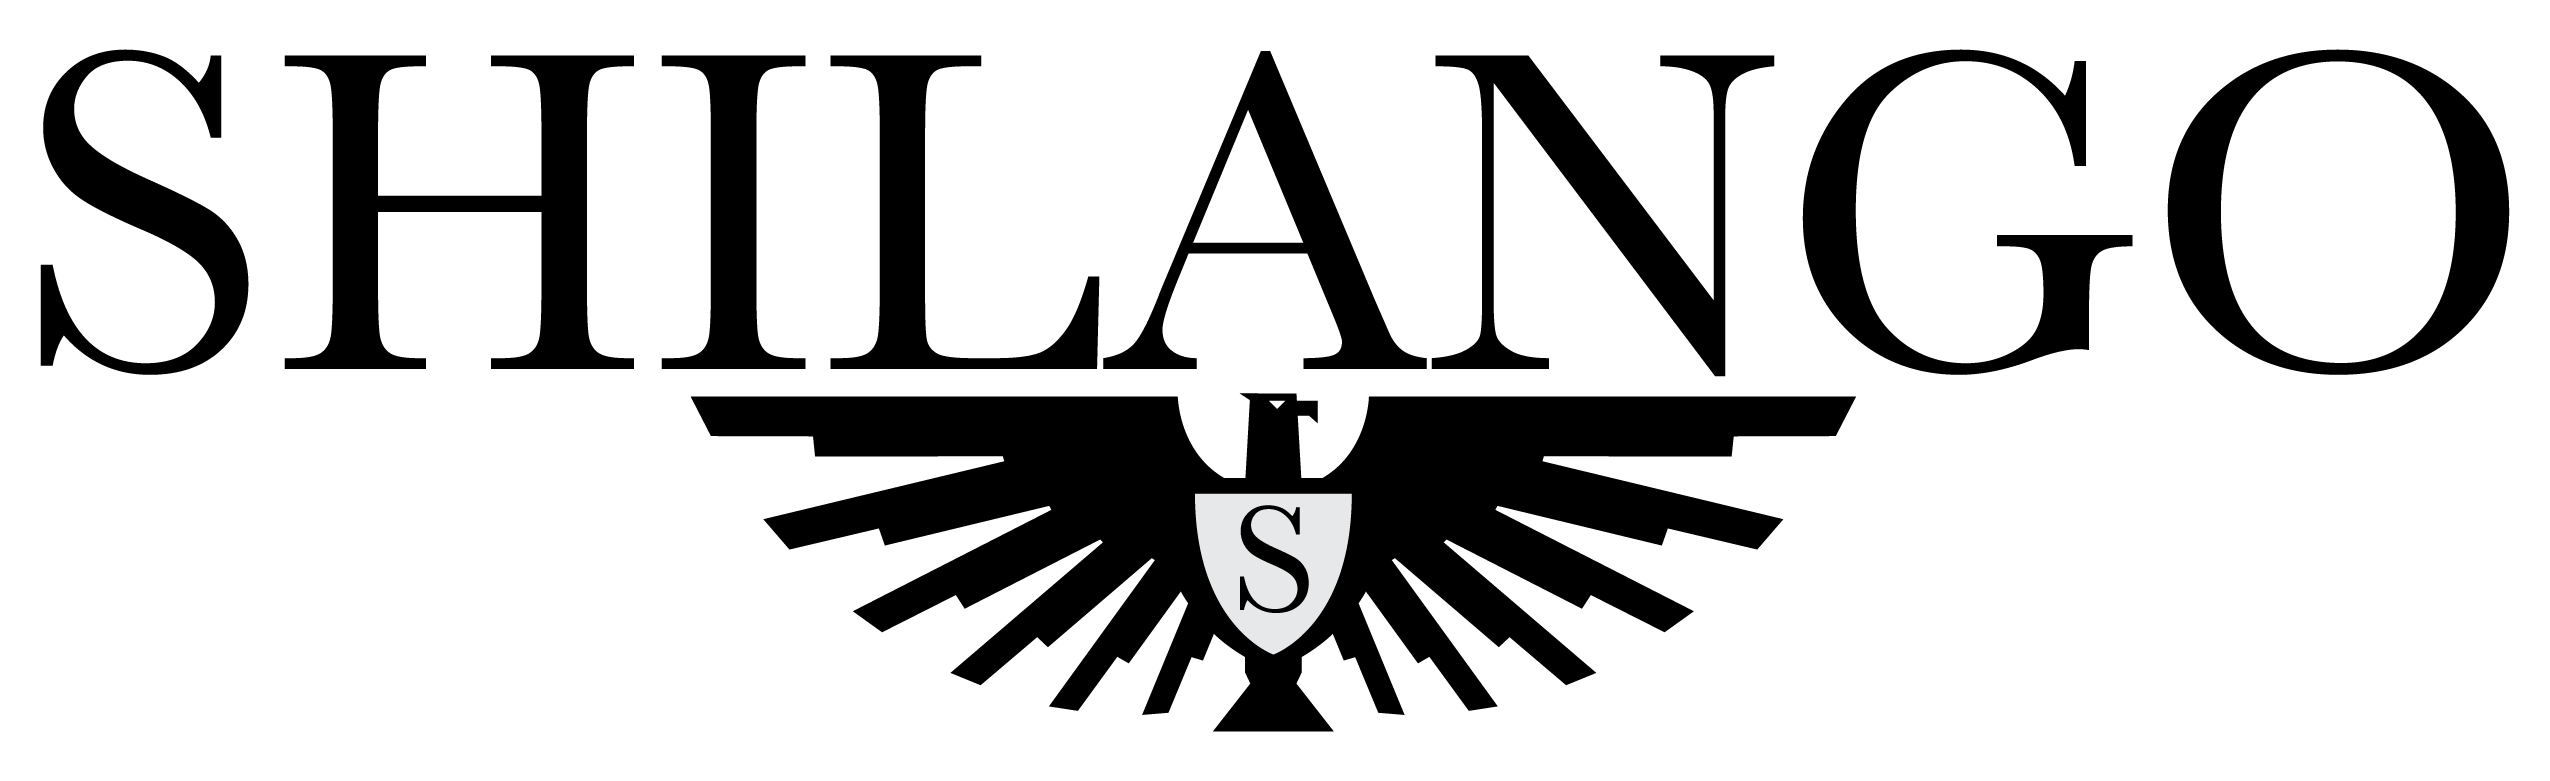 Shilango